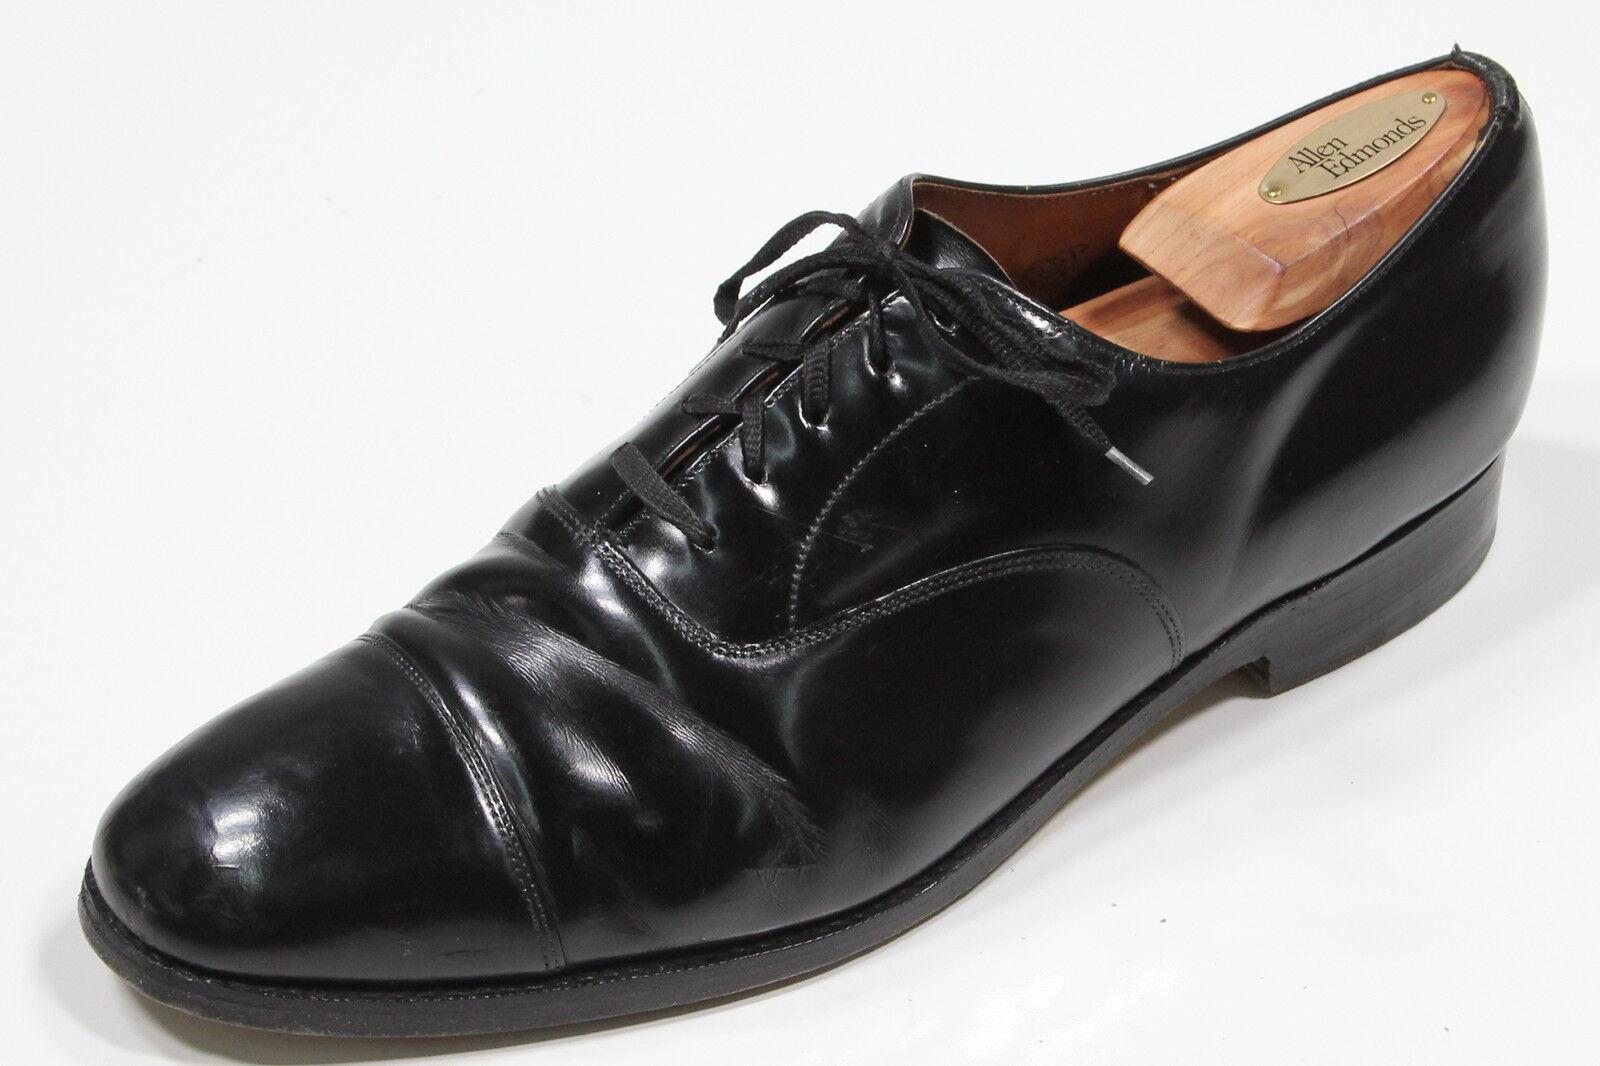 CHURCH'S Schwarz 'Balmoral' Grade Leder Oxford Formelle Schuhe Us 10 D